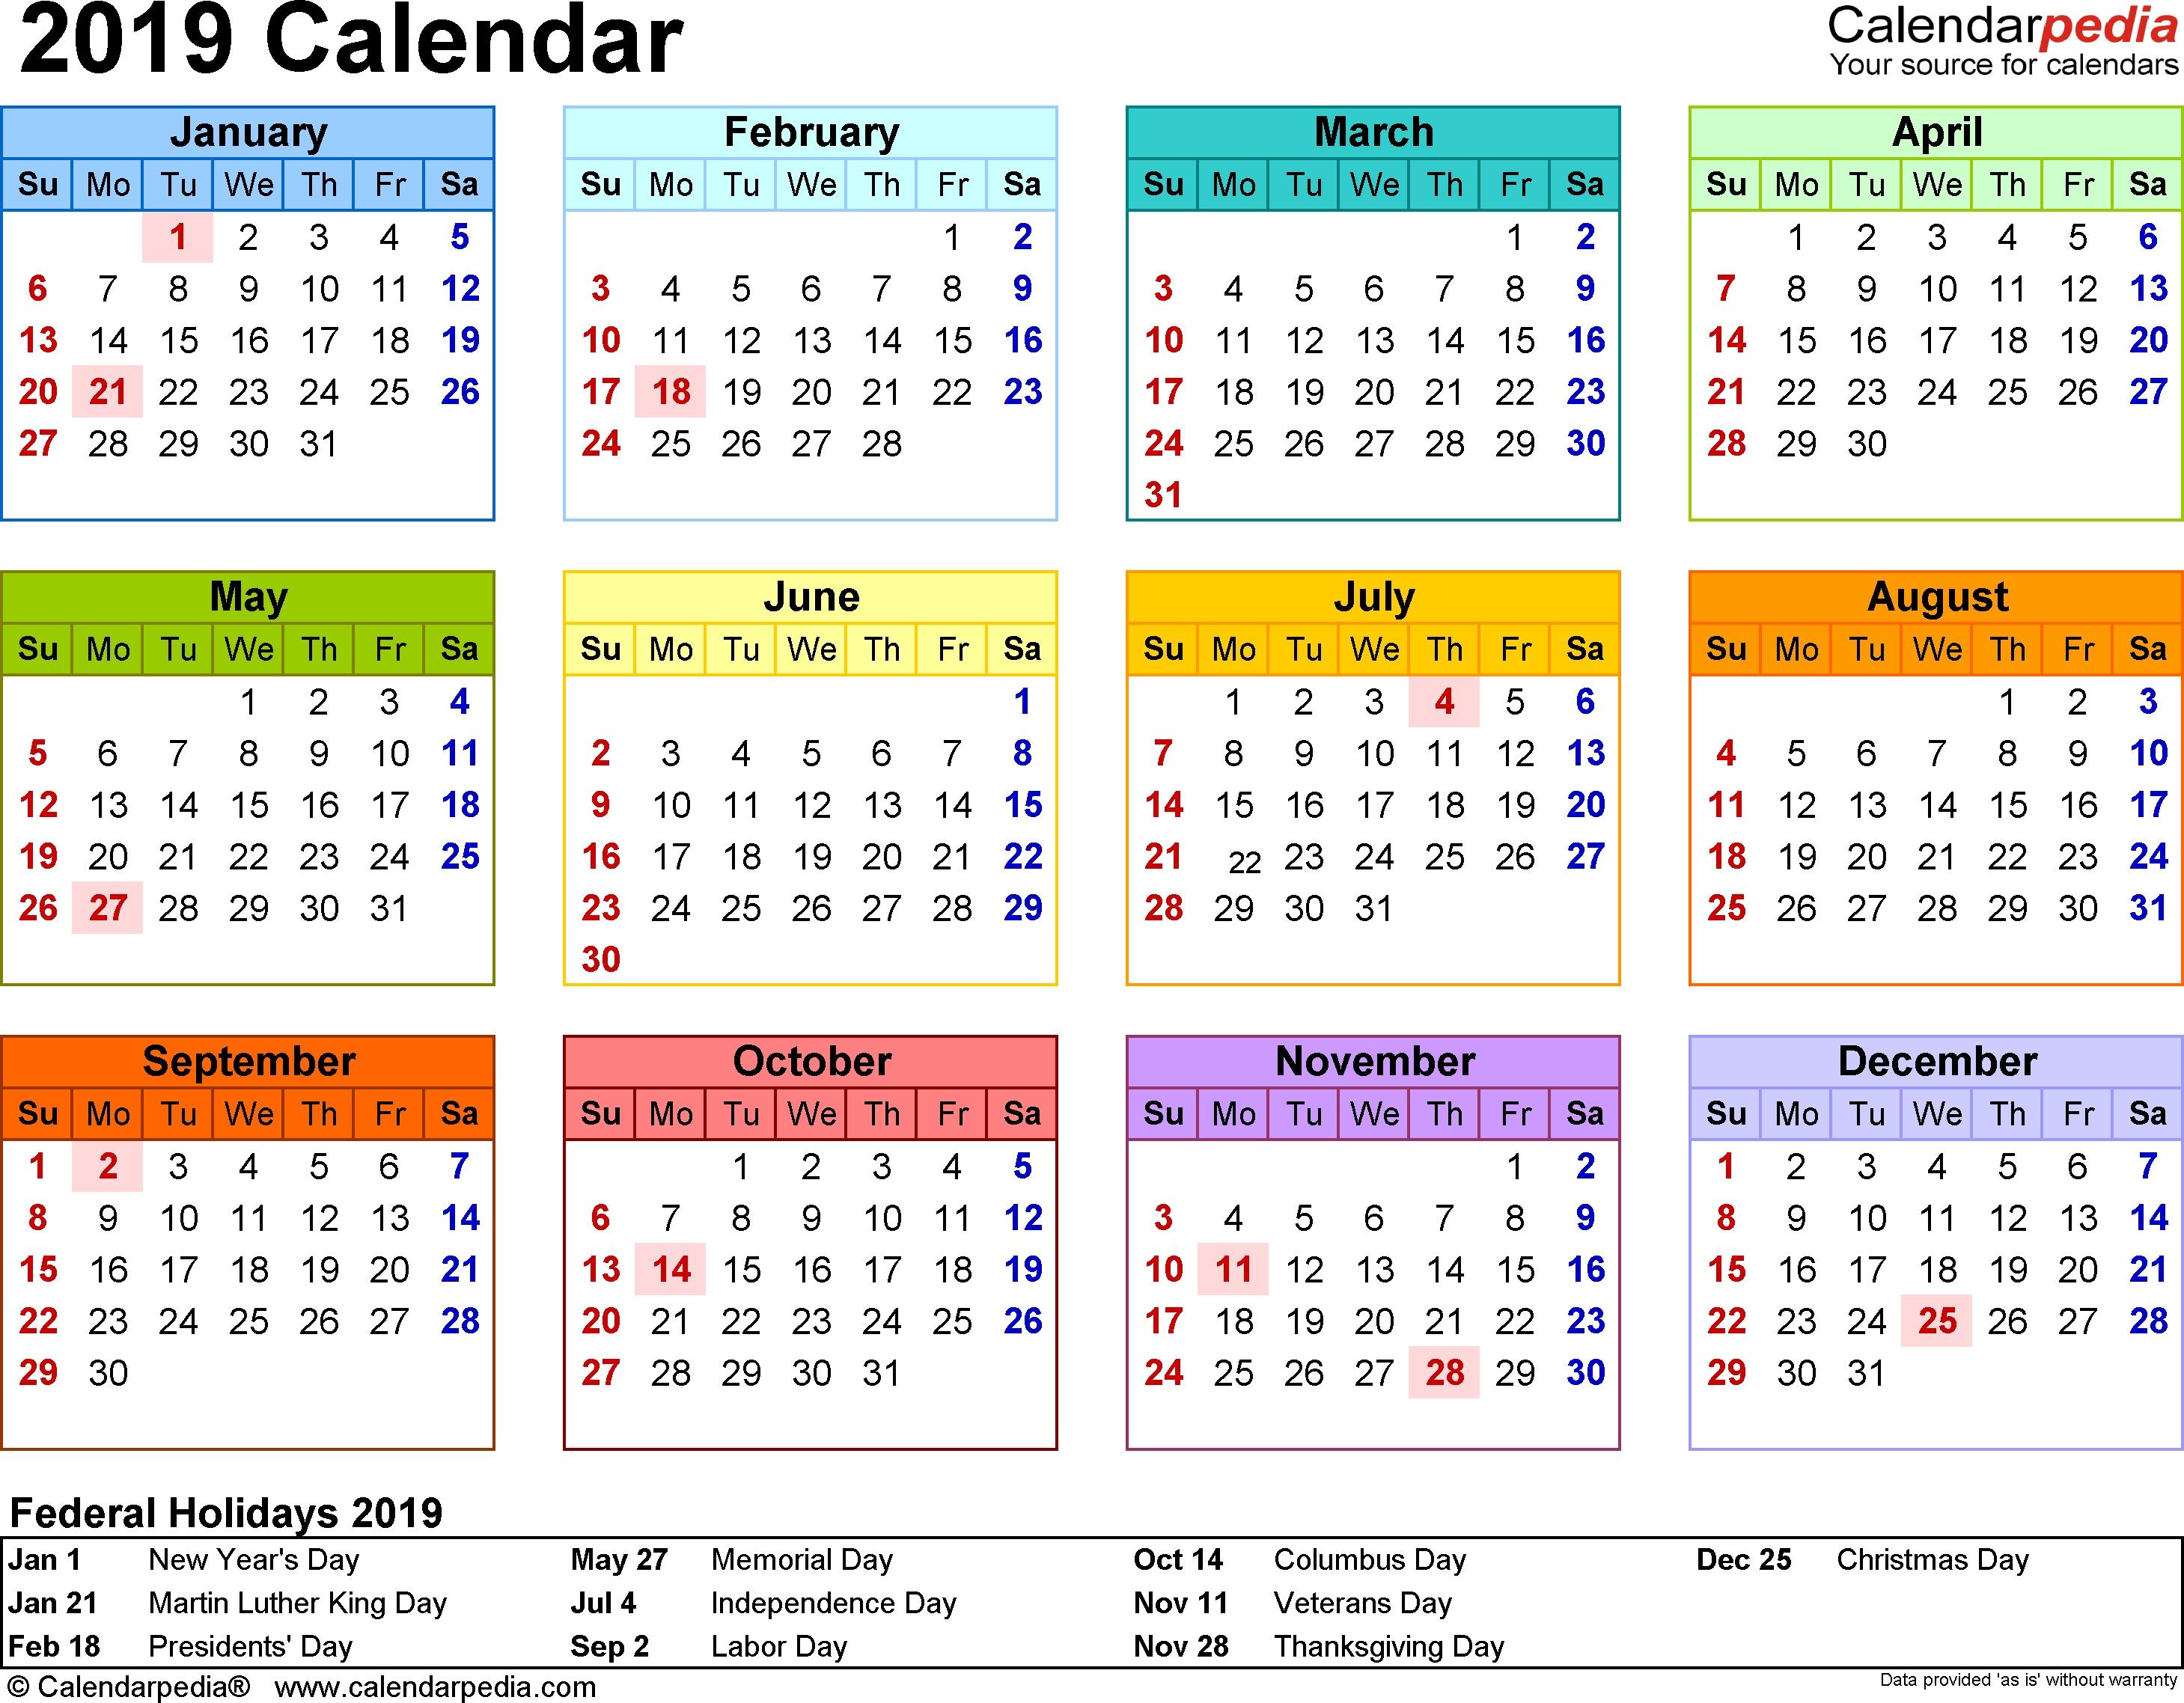 2019 Calendar - Download 17 Free Printable Excel Templates (.xlsx) with Split Calendar 2019 2020 South Australia